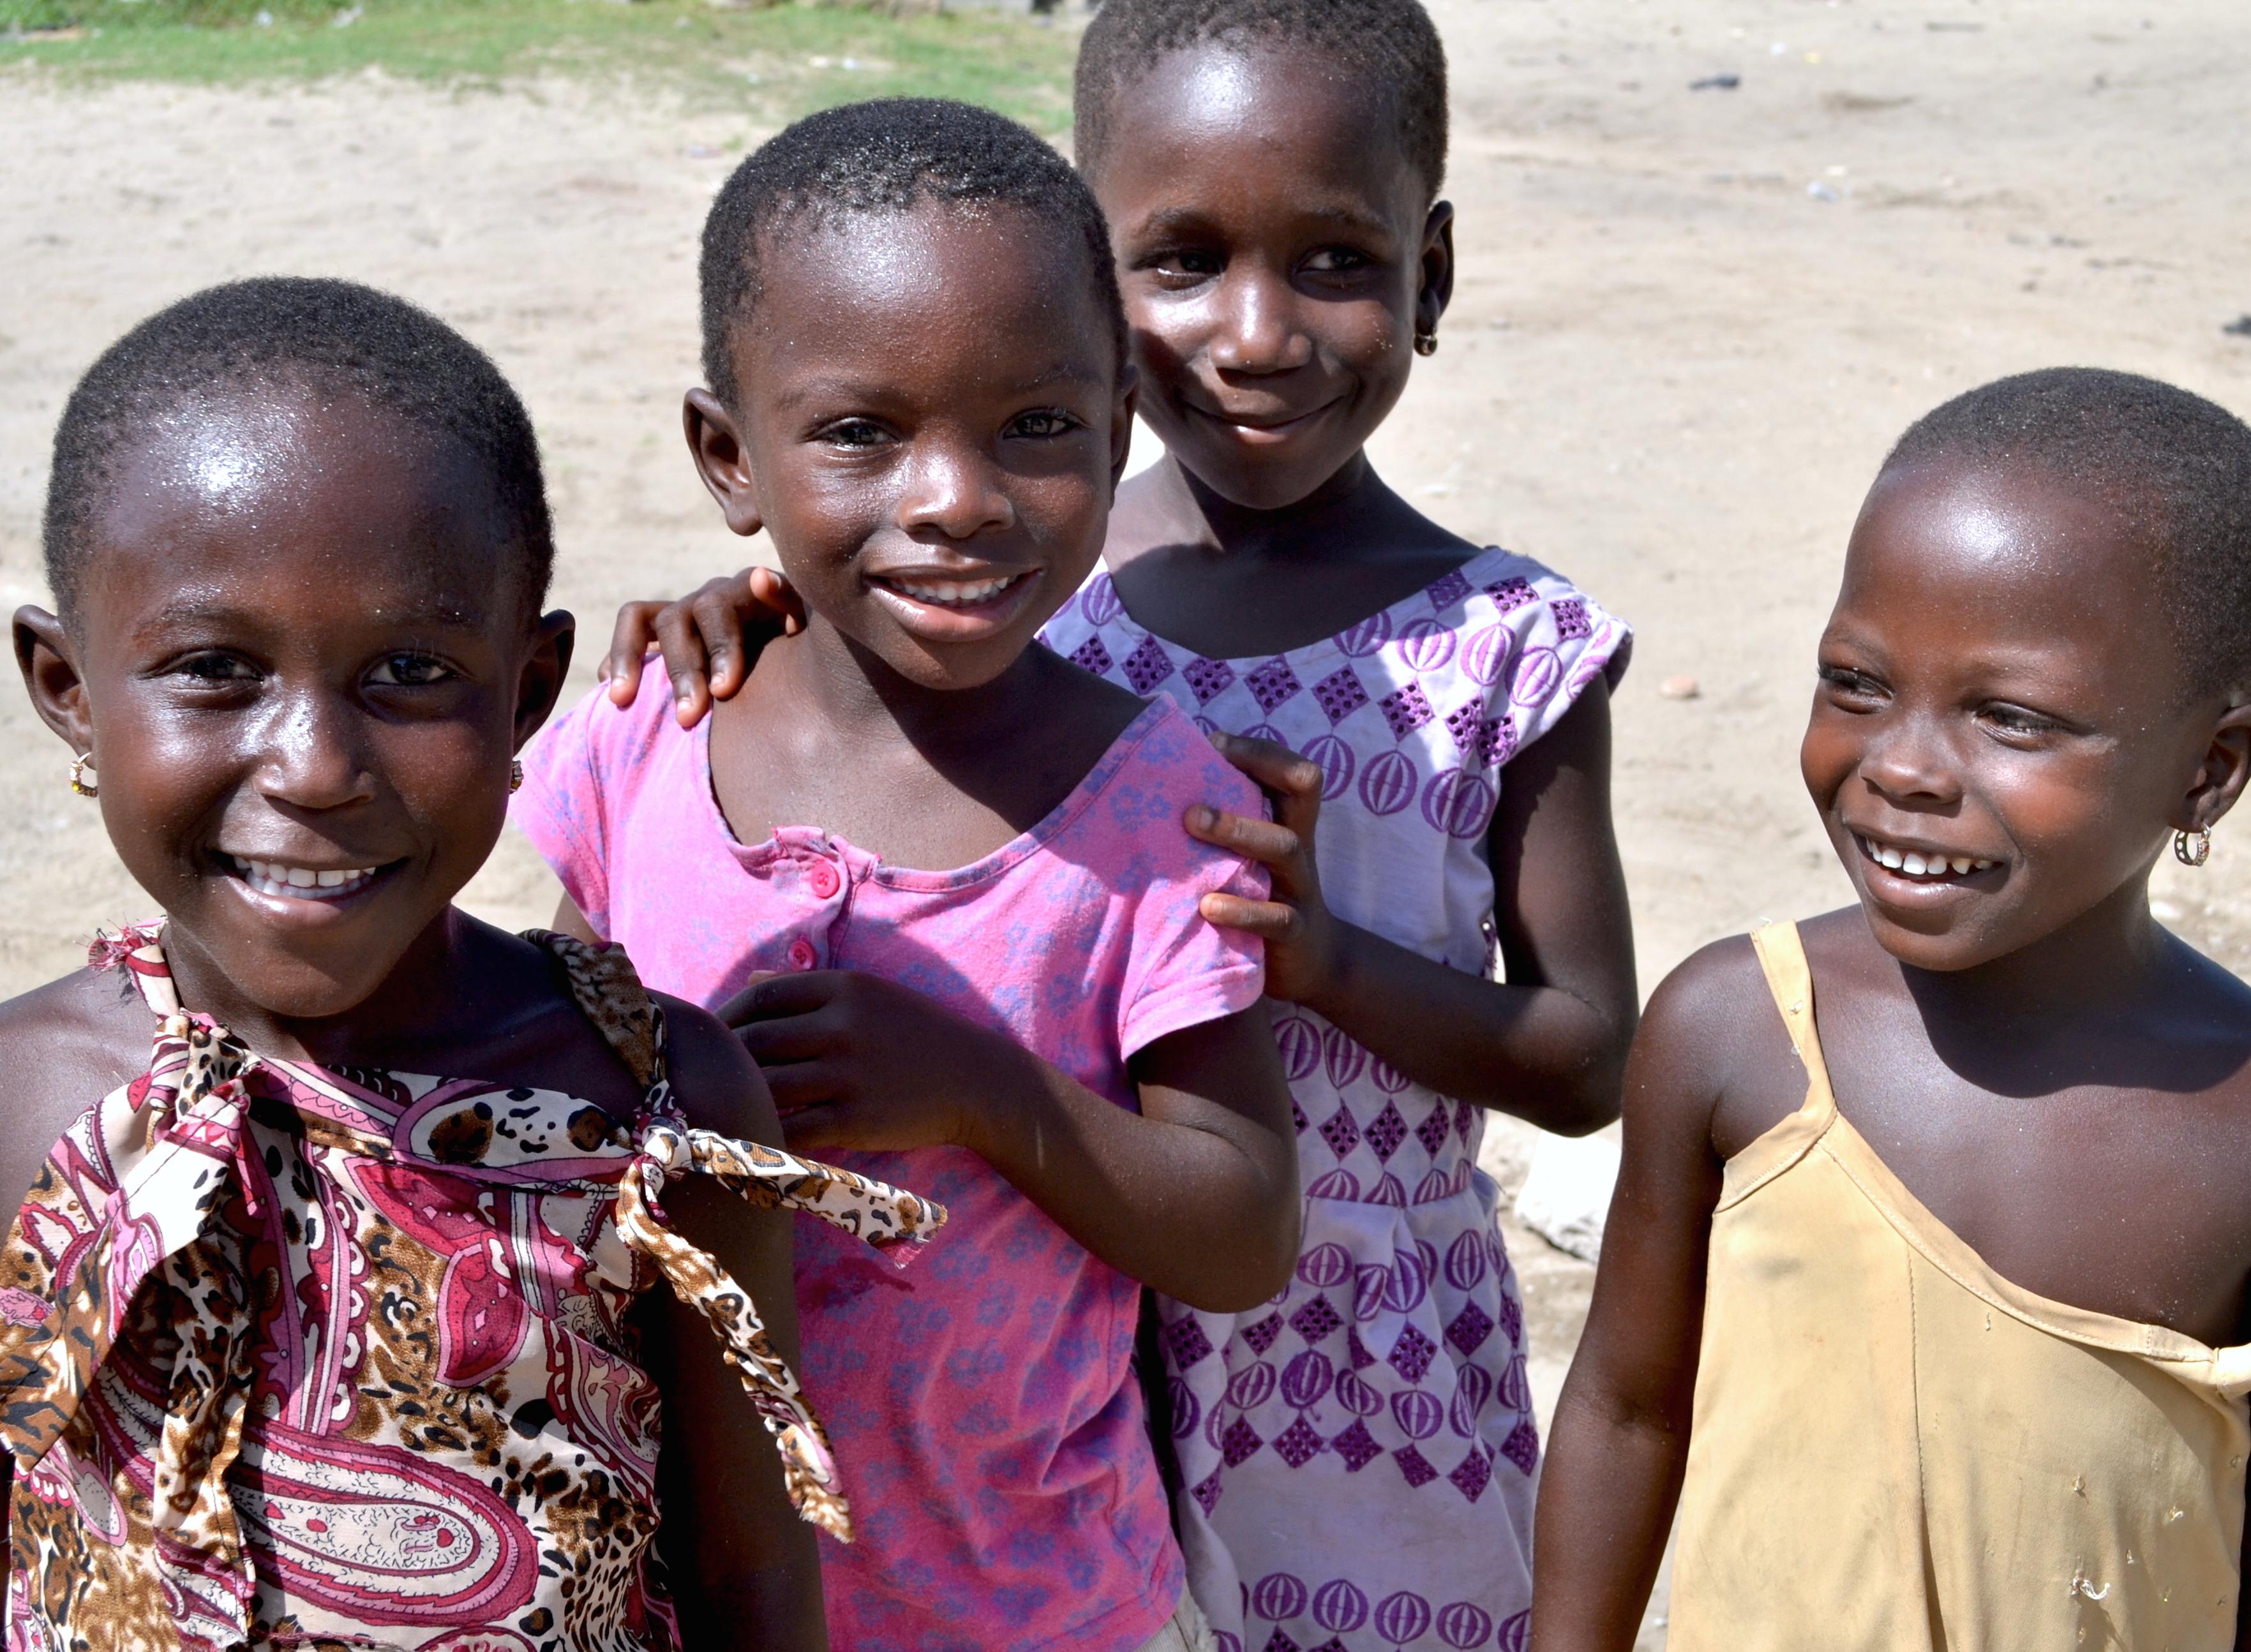 Build A School for 200 street children in Ghana - GlobalGiving